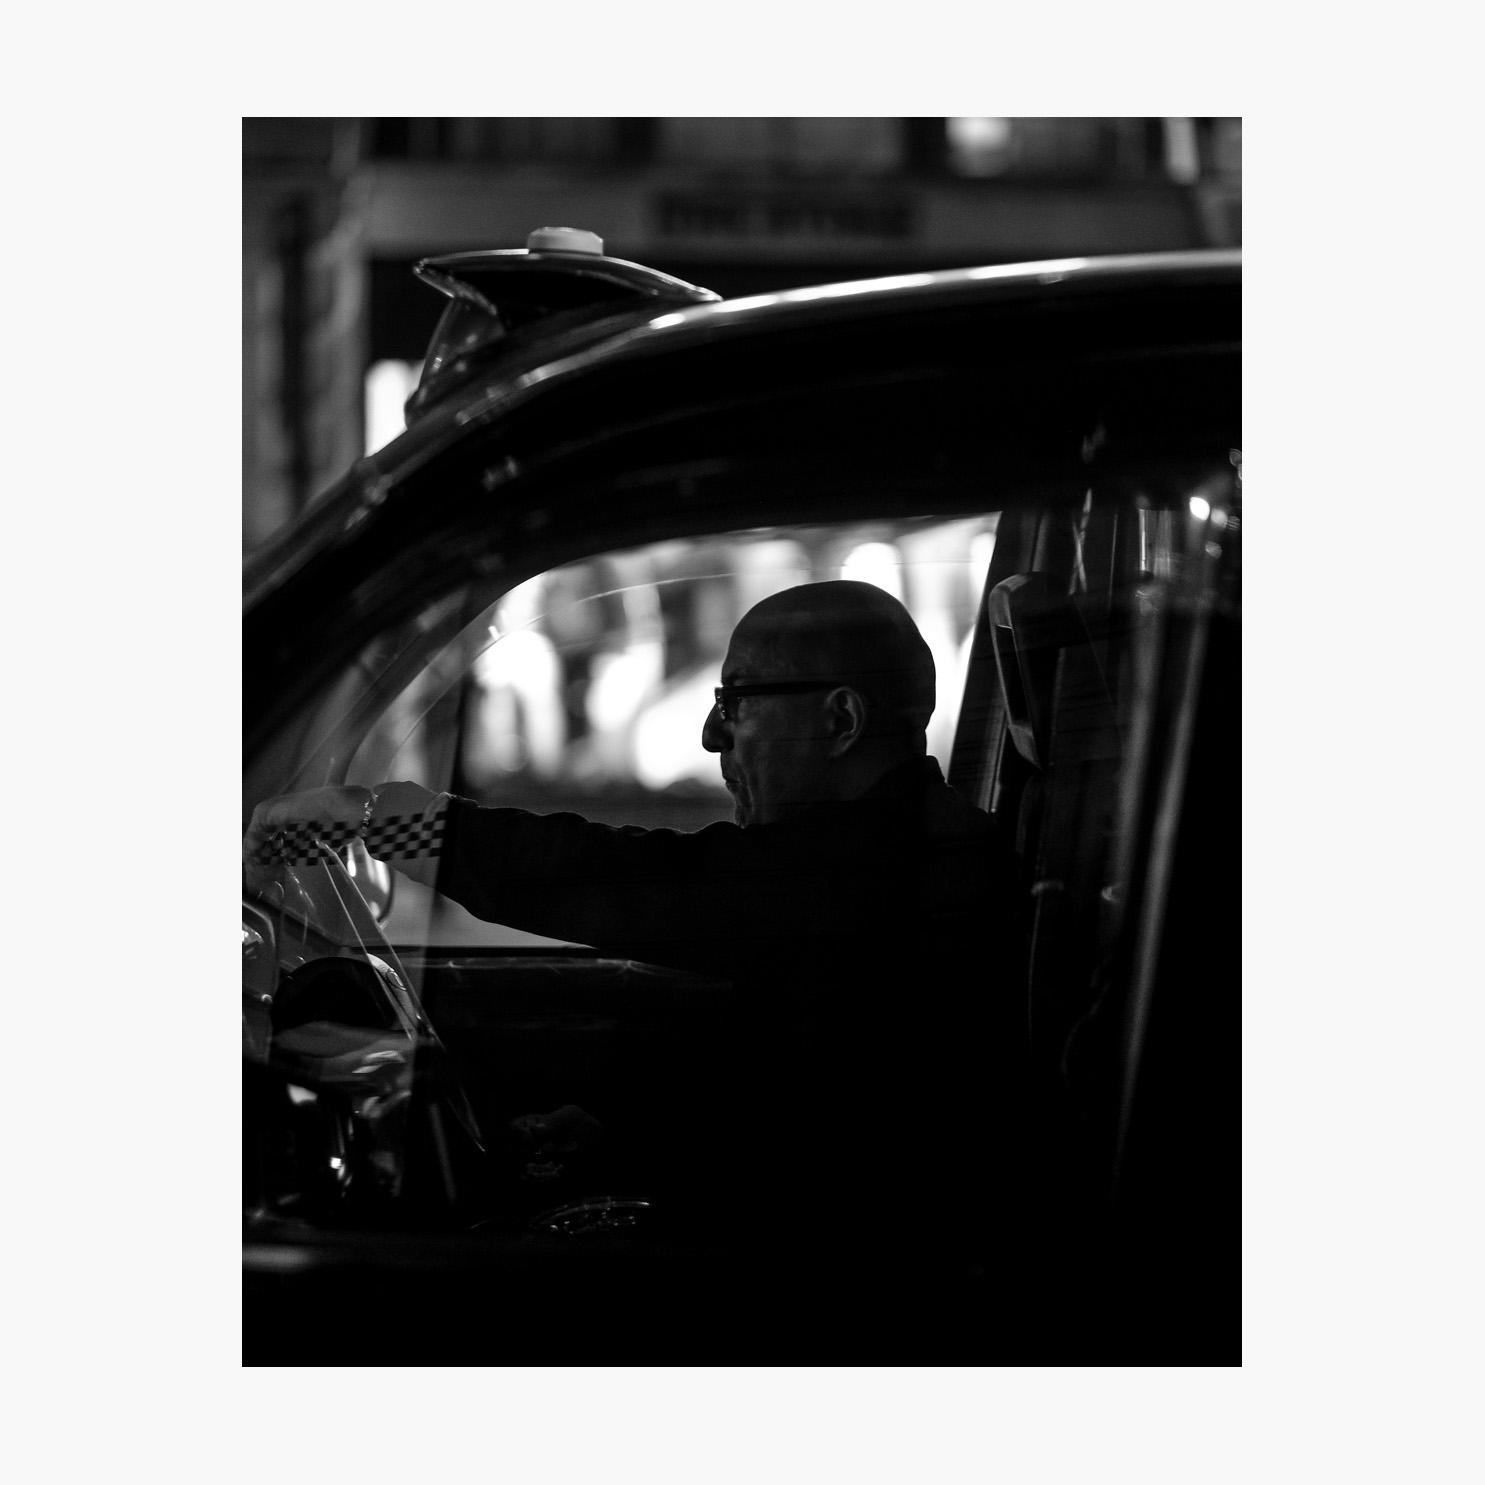 ©-Harry-W-Edmonds-2018-@photographersnote-Street-Sights-Social-PN08.jpg